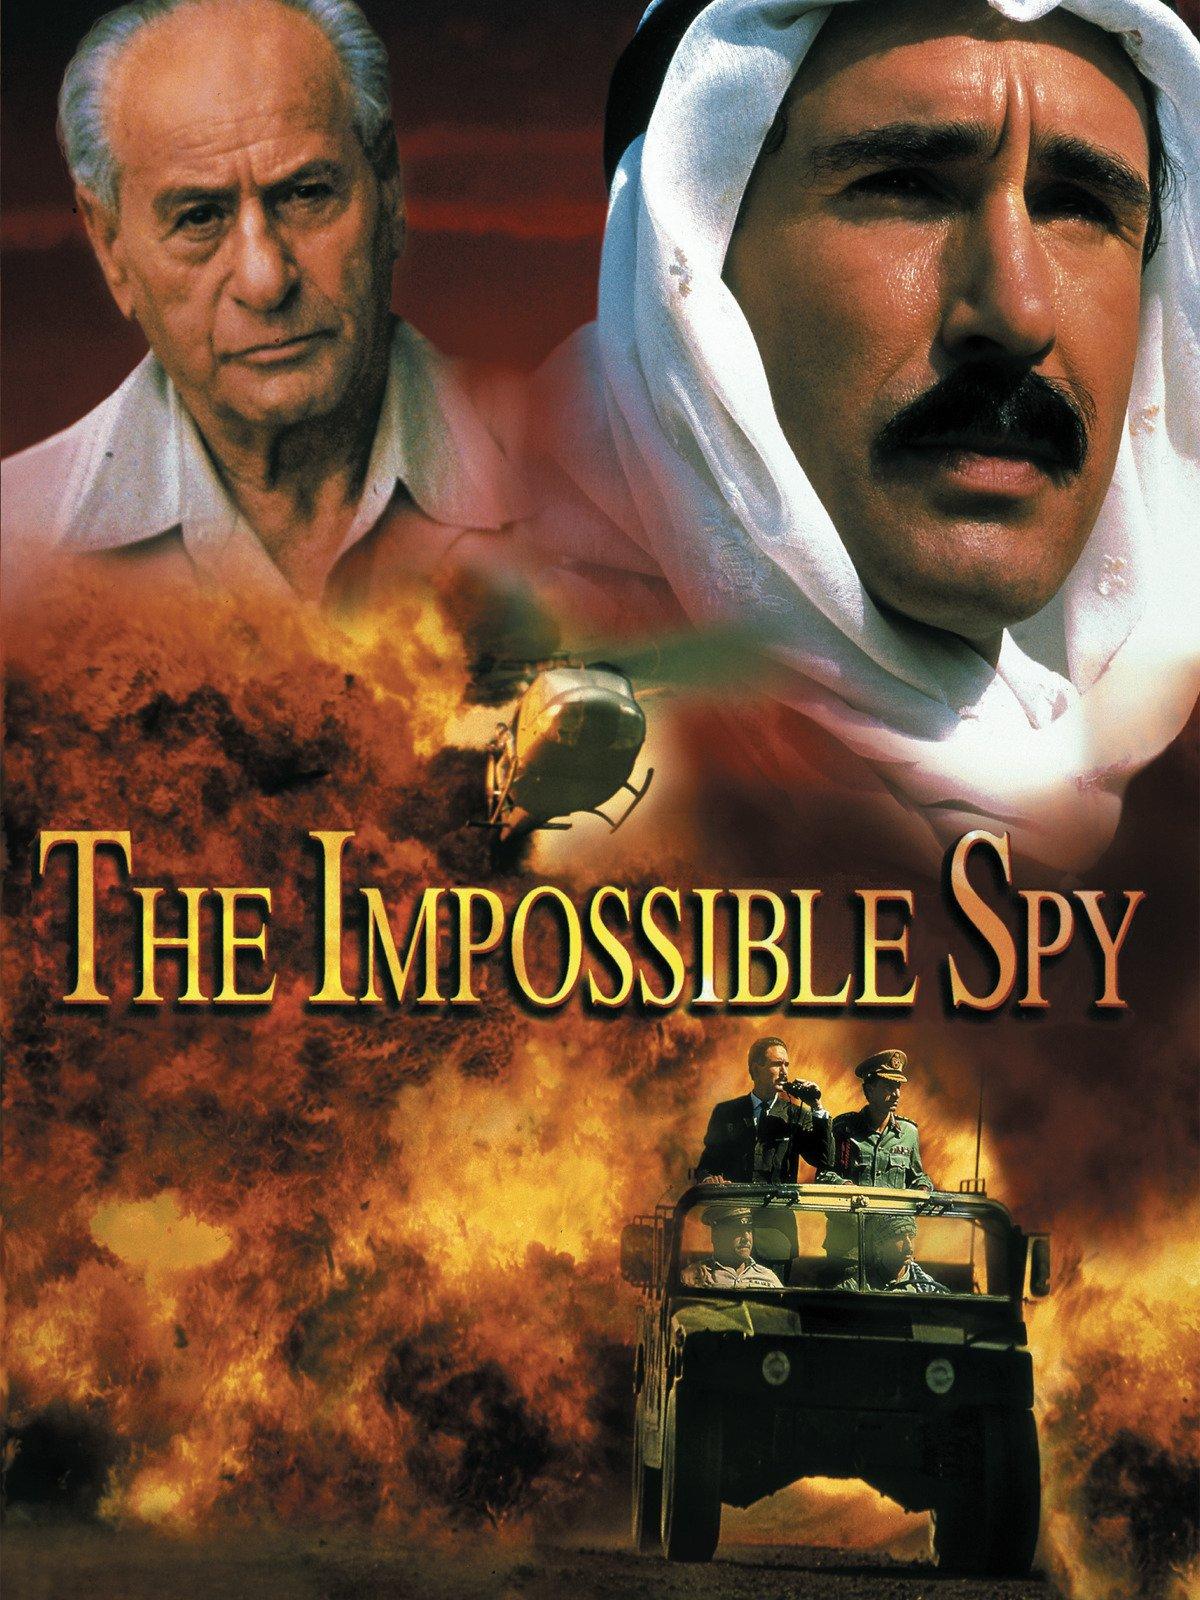 Amazon.com: The Impossible Spy: John Shea, Eli Wallach, Sasson Gabai ...